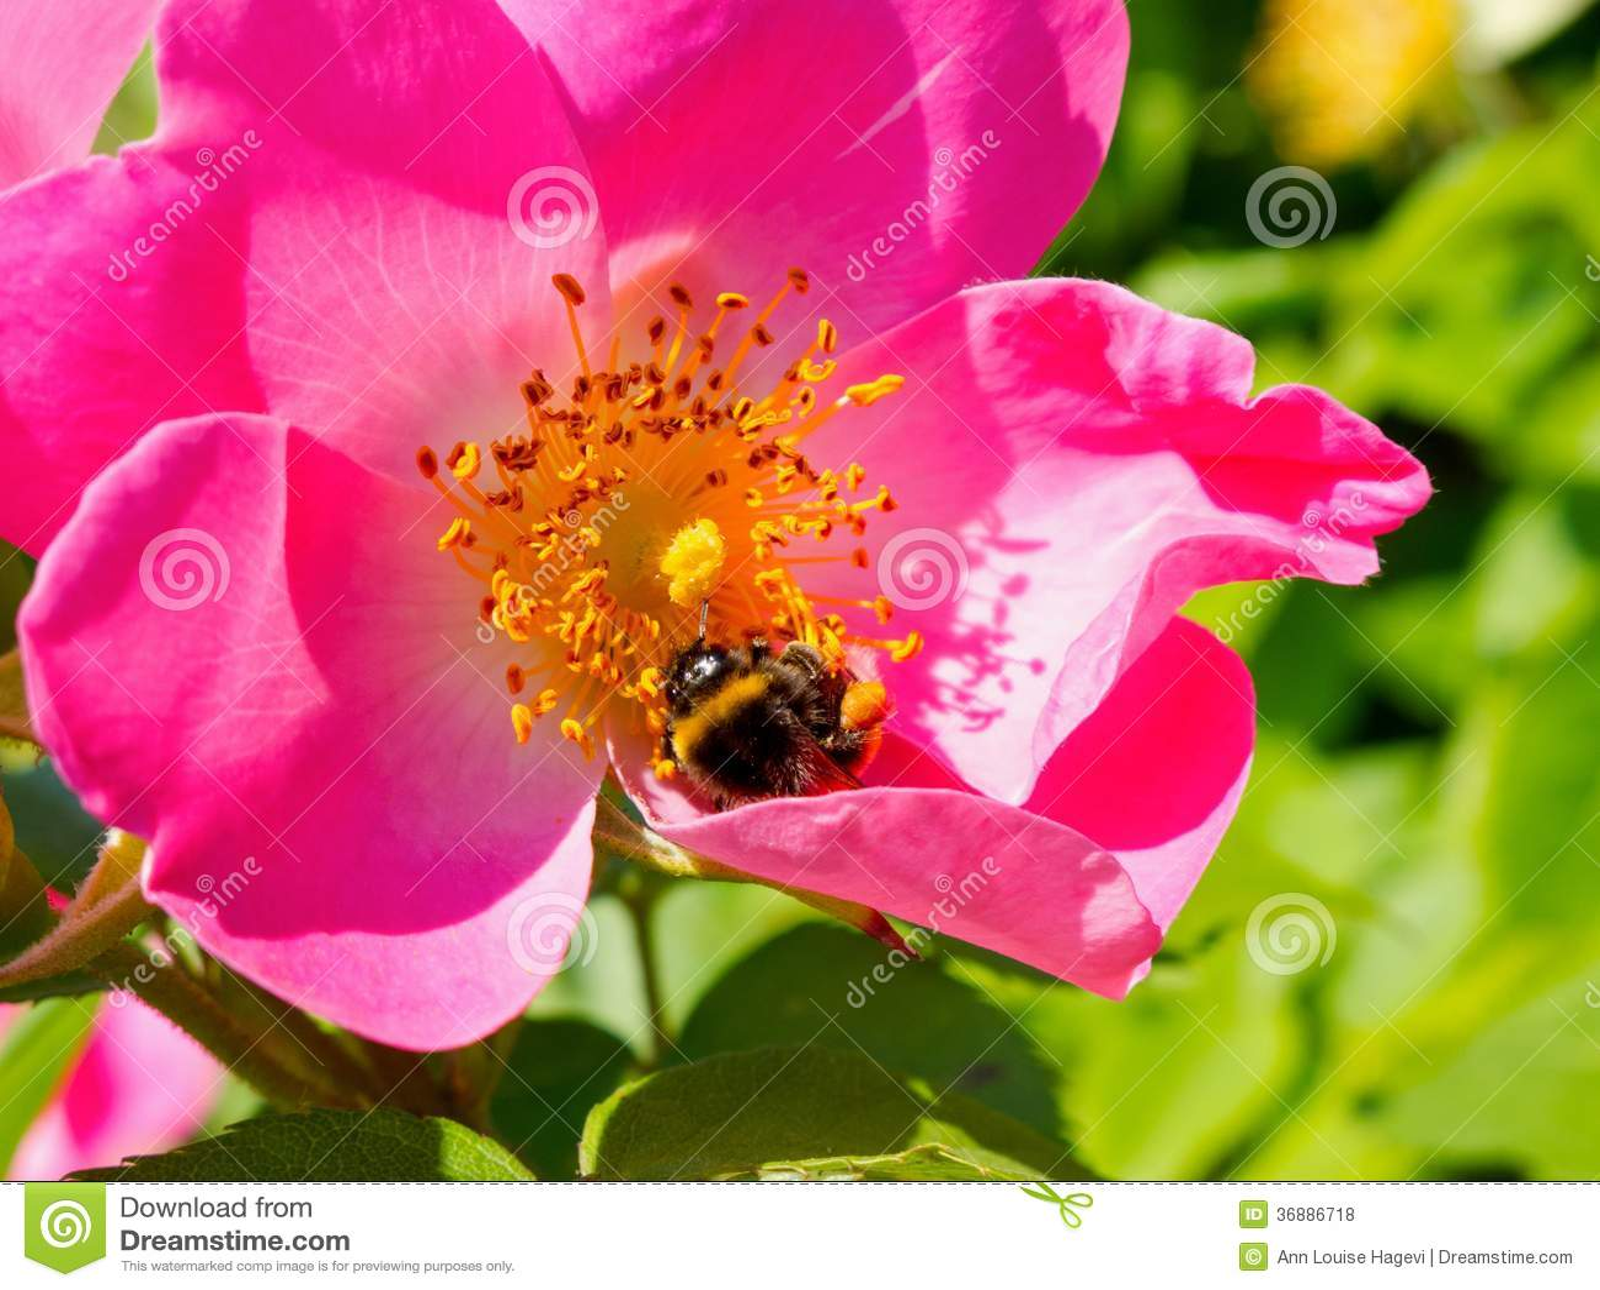 Download Rosa canina rosa fotografia stock. Immagine di flora - 36886718